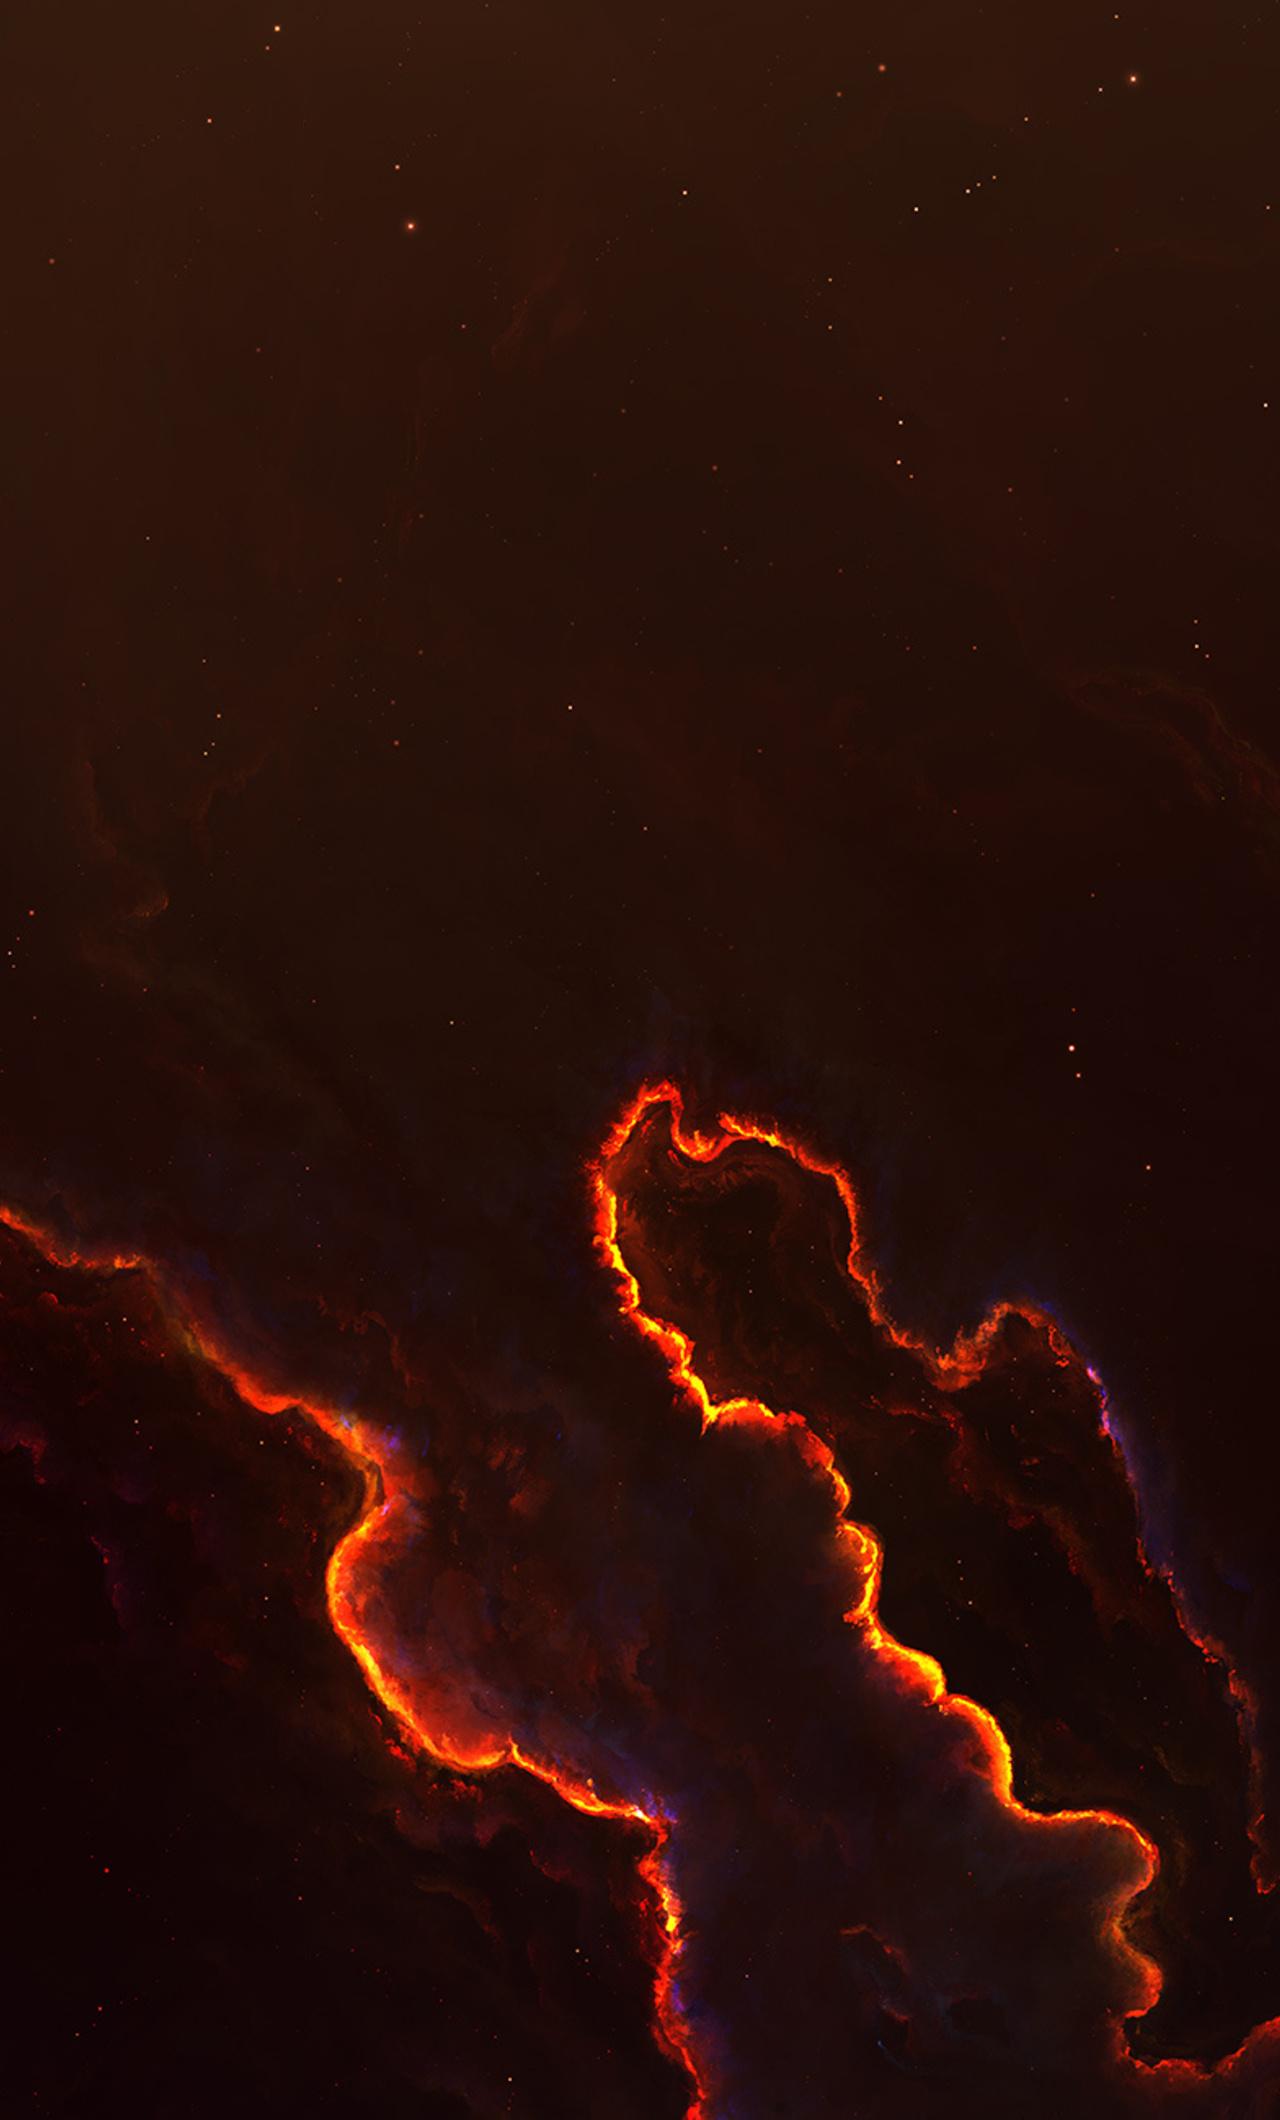 spacescapes-hd-9i.jpg